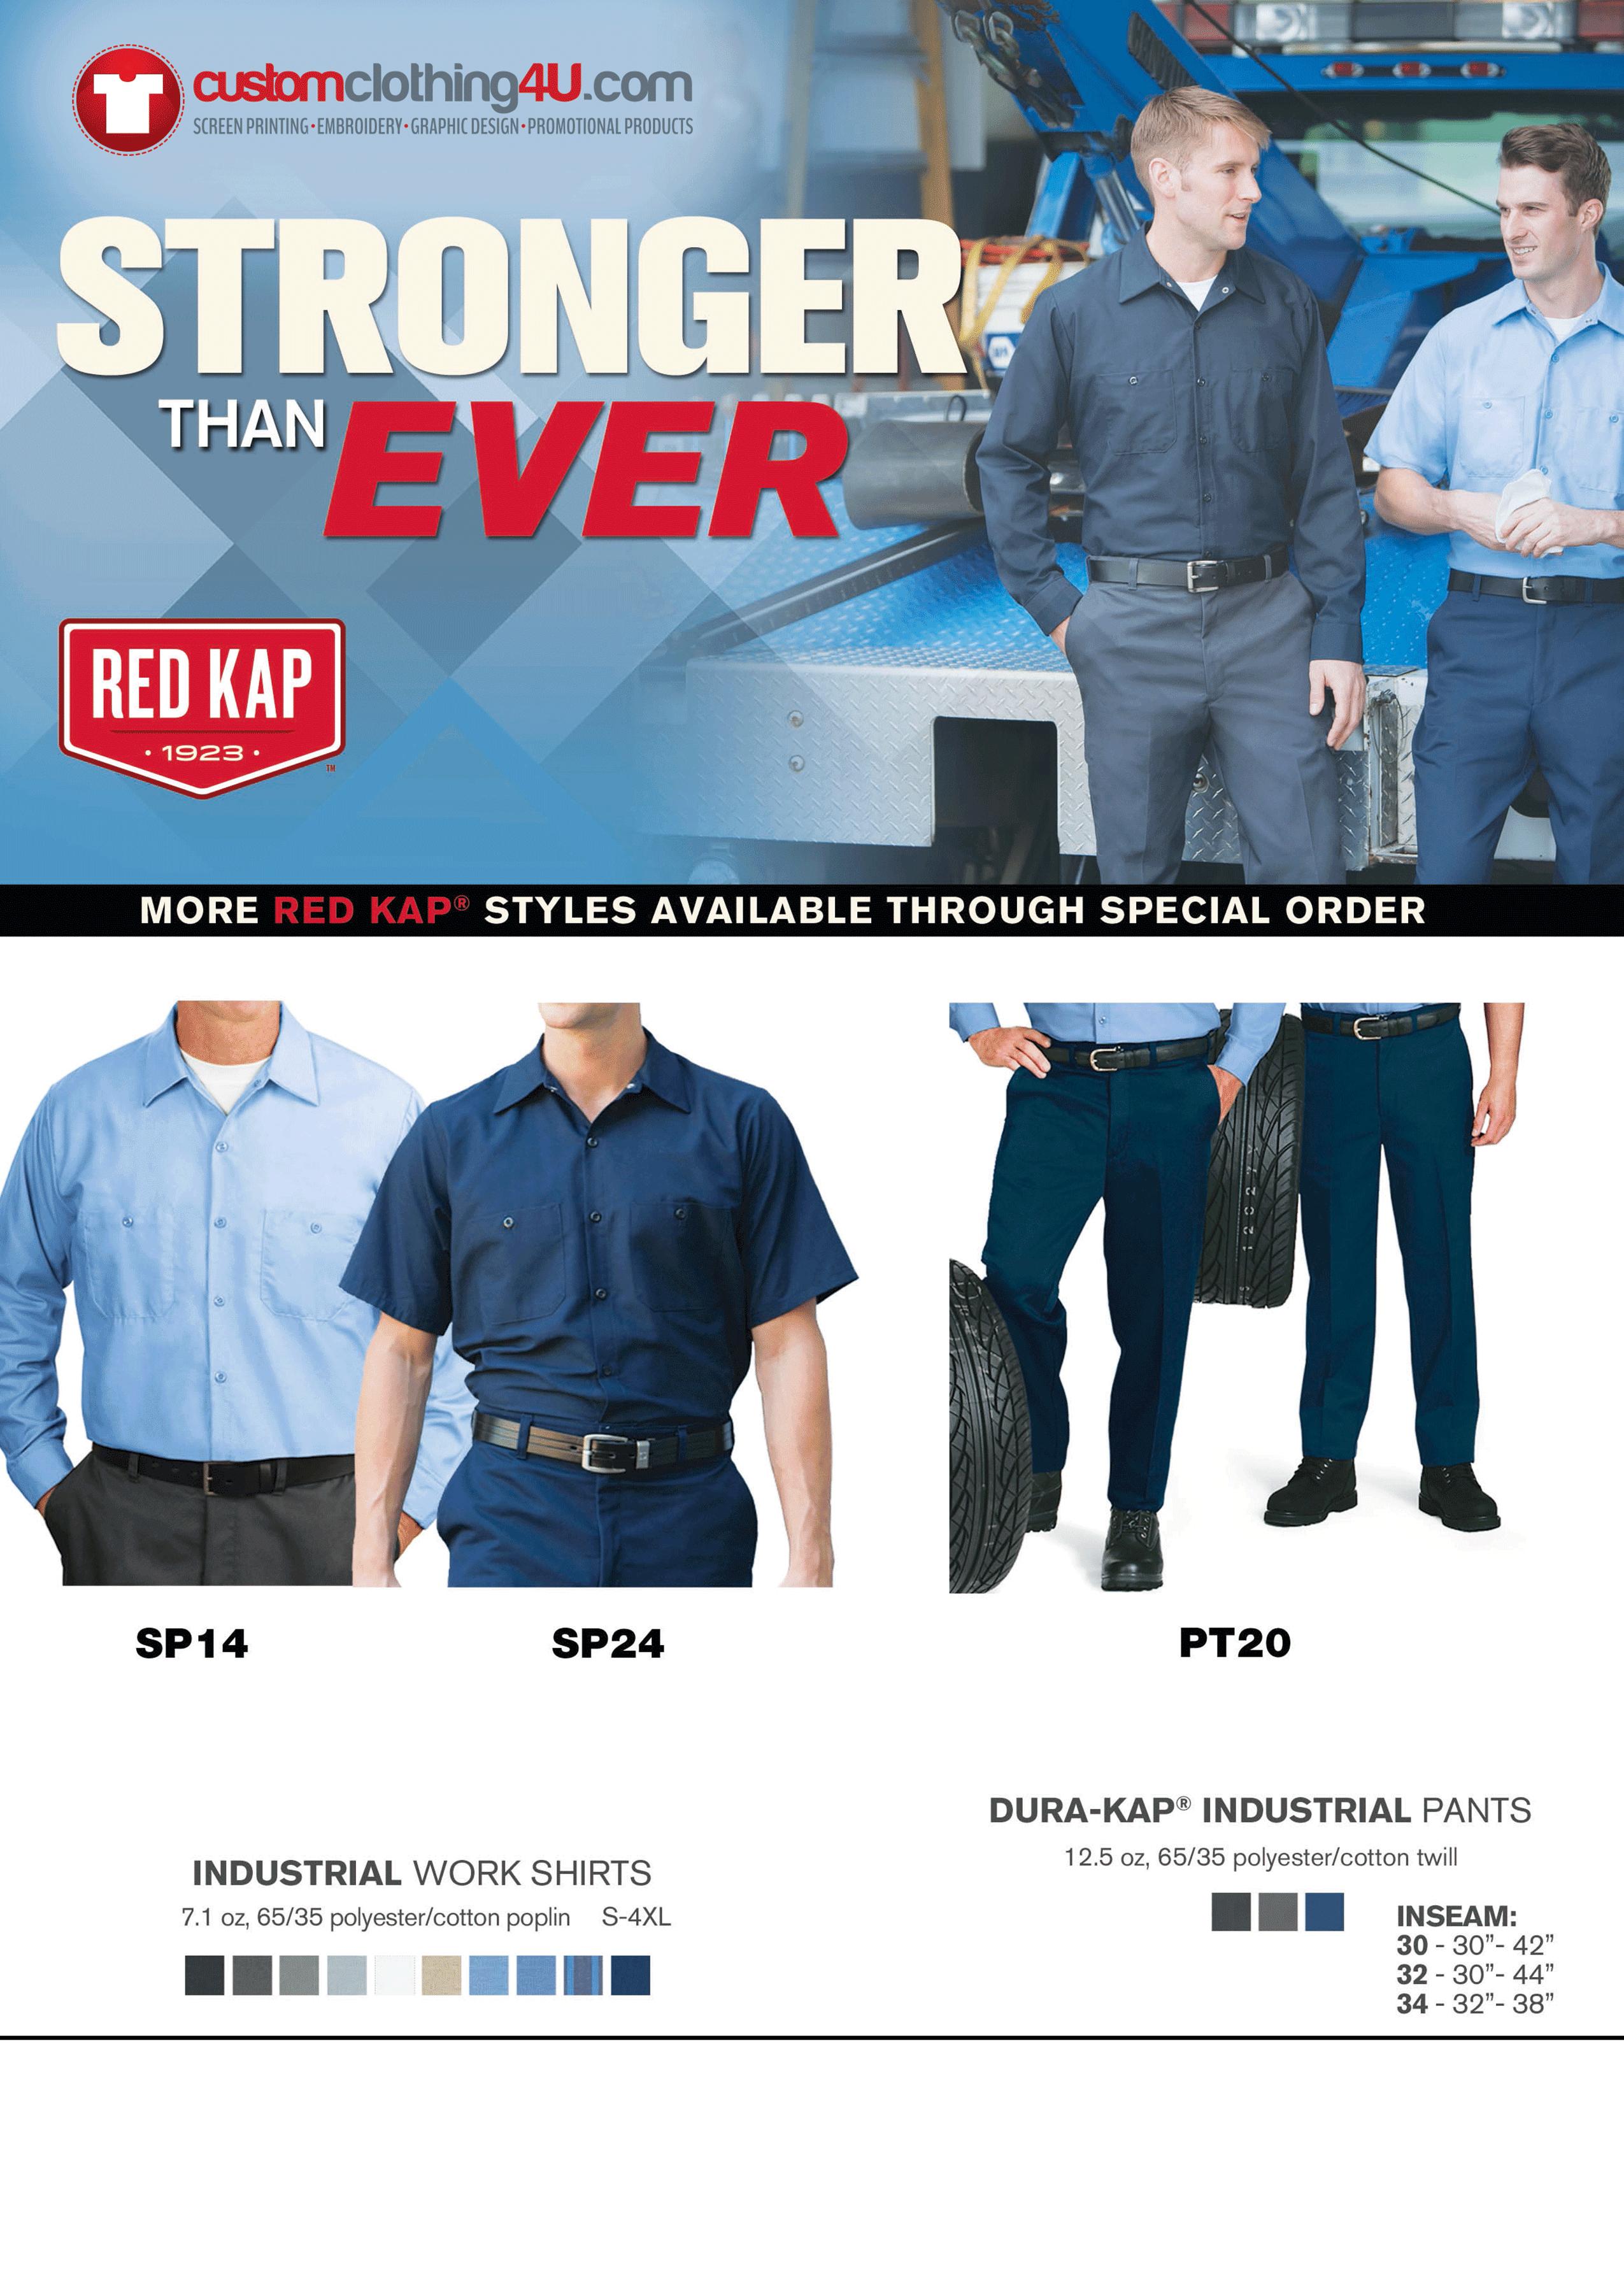 custom printed uniforms - branded workwear - custom clothing